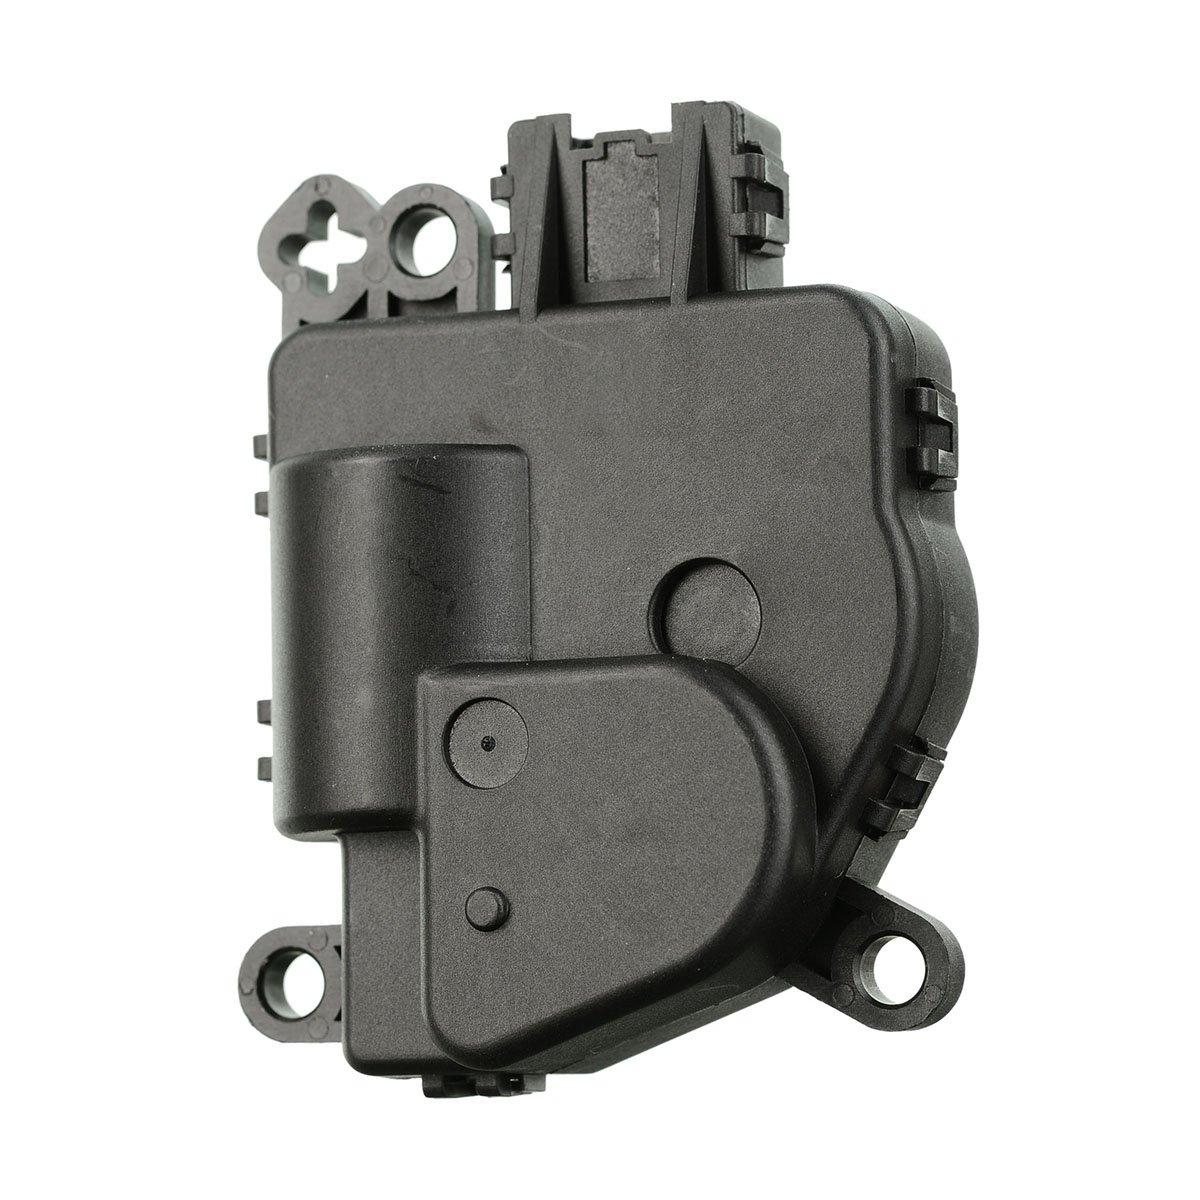 A-Premium HVAC A//C Heater Blend Door Actuator for Ford Fiesta 2011-2016 Air Inlet Actuator